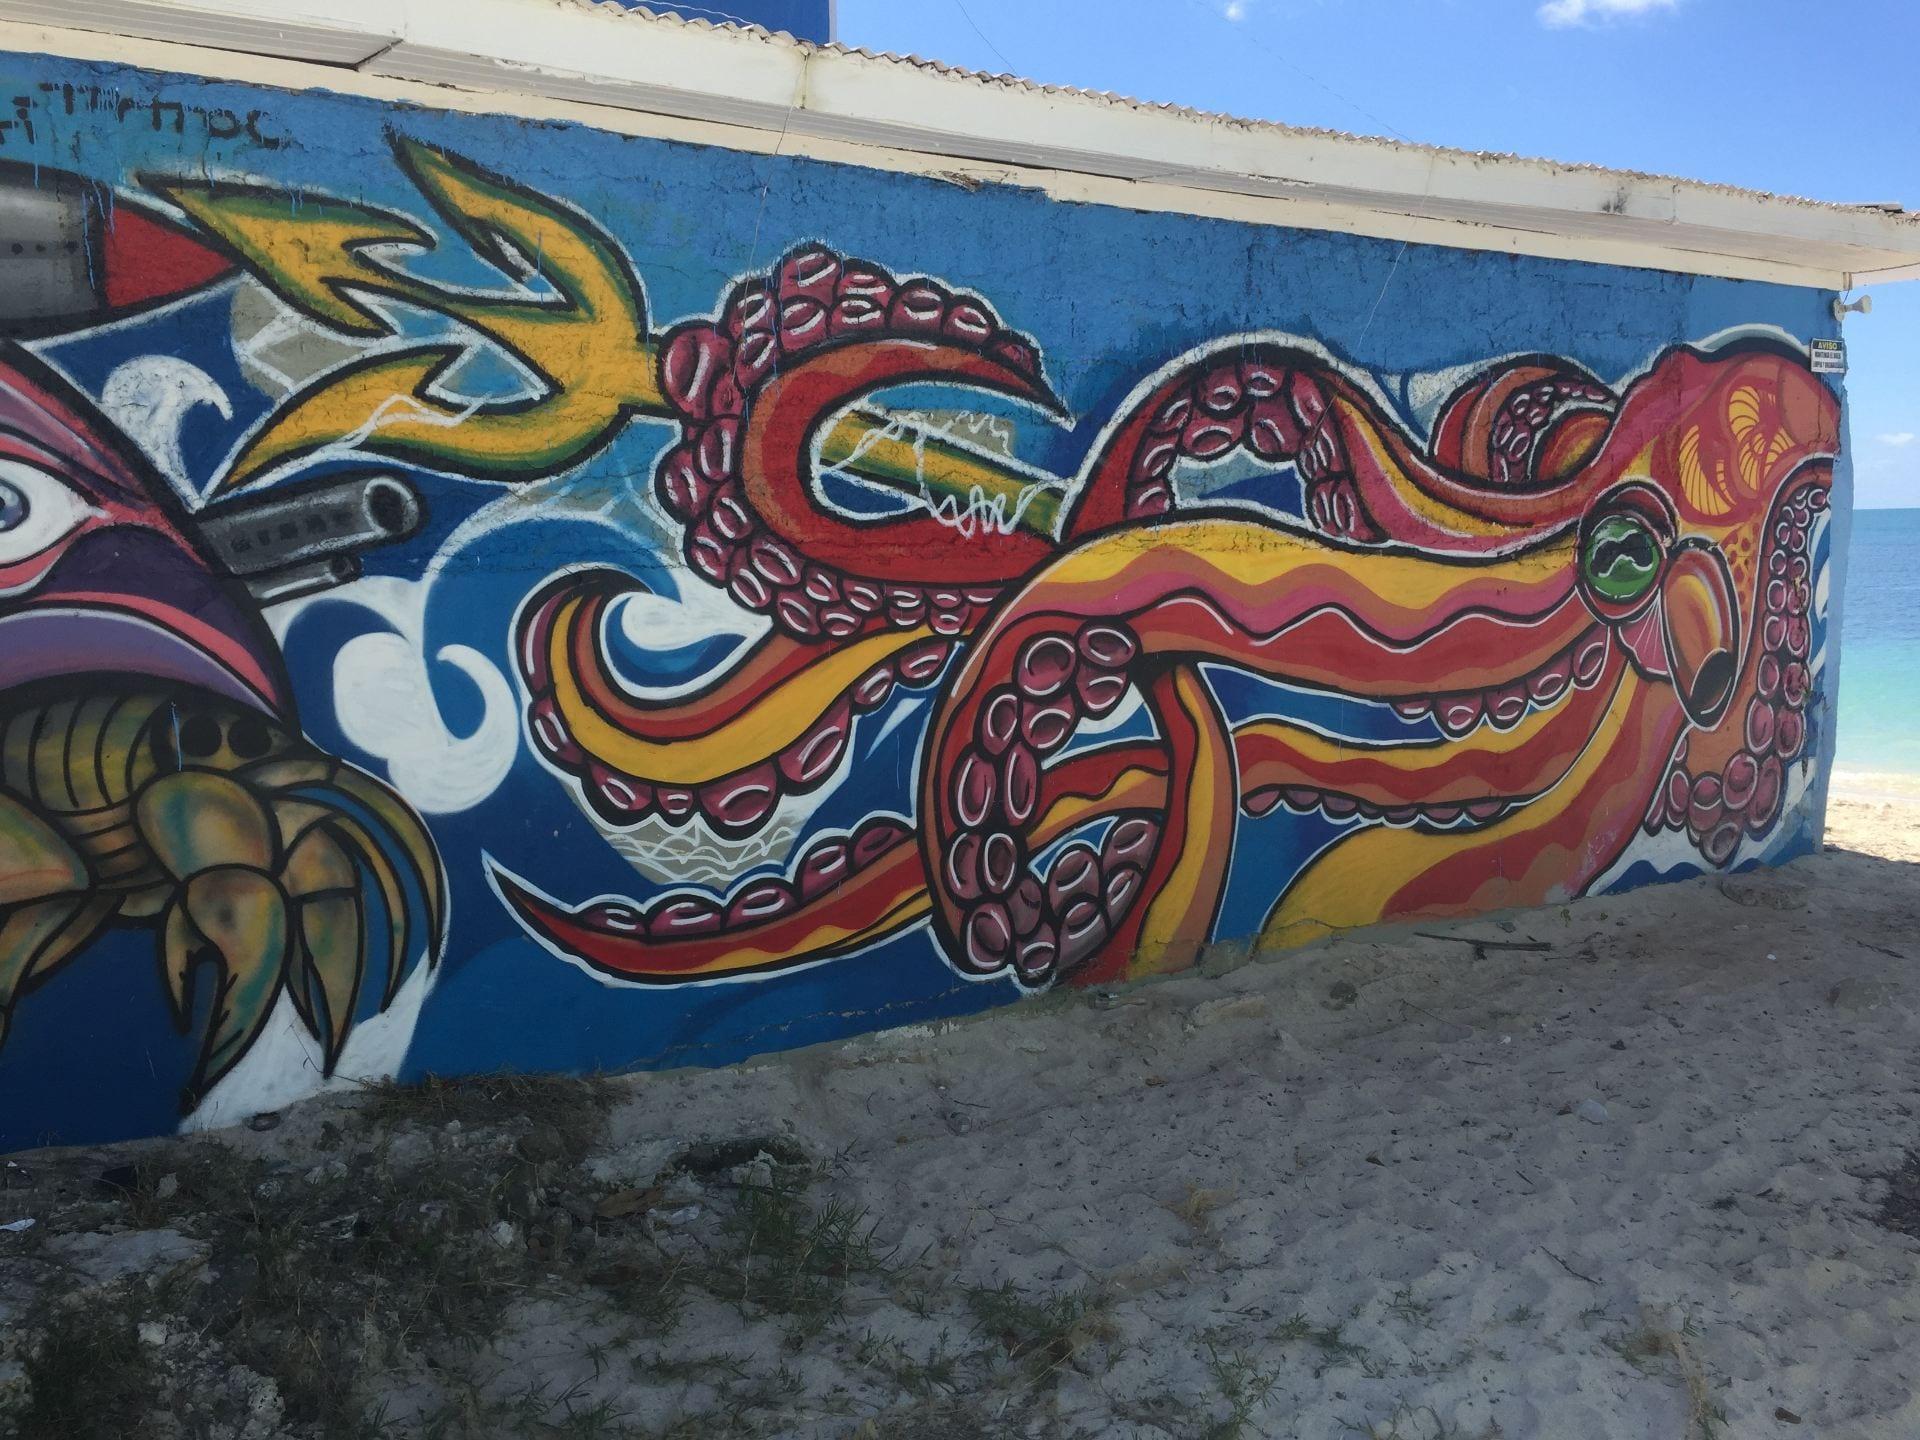 mural, Puerto Rico, Hurricane Maria